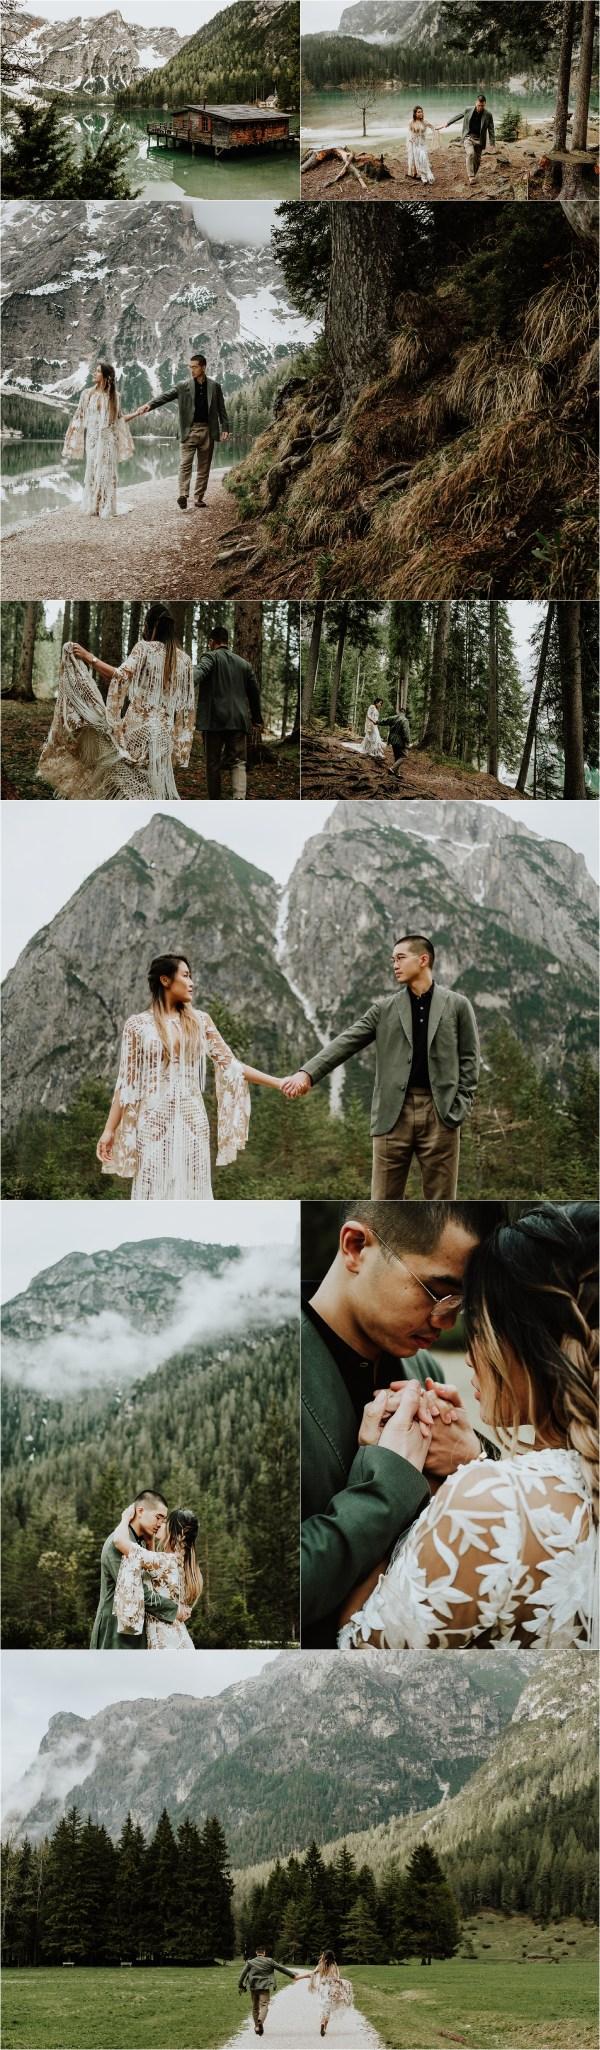 pre-wedding shoot at Lago Di Braies, Pre-Wedding Shoot At Lago Di Braies In The Dolomites